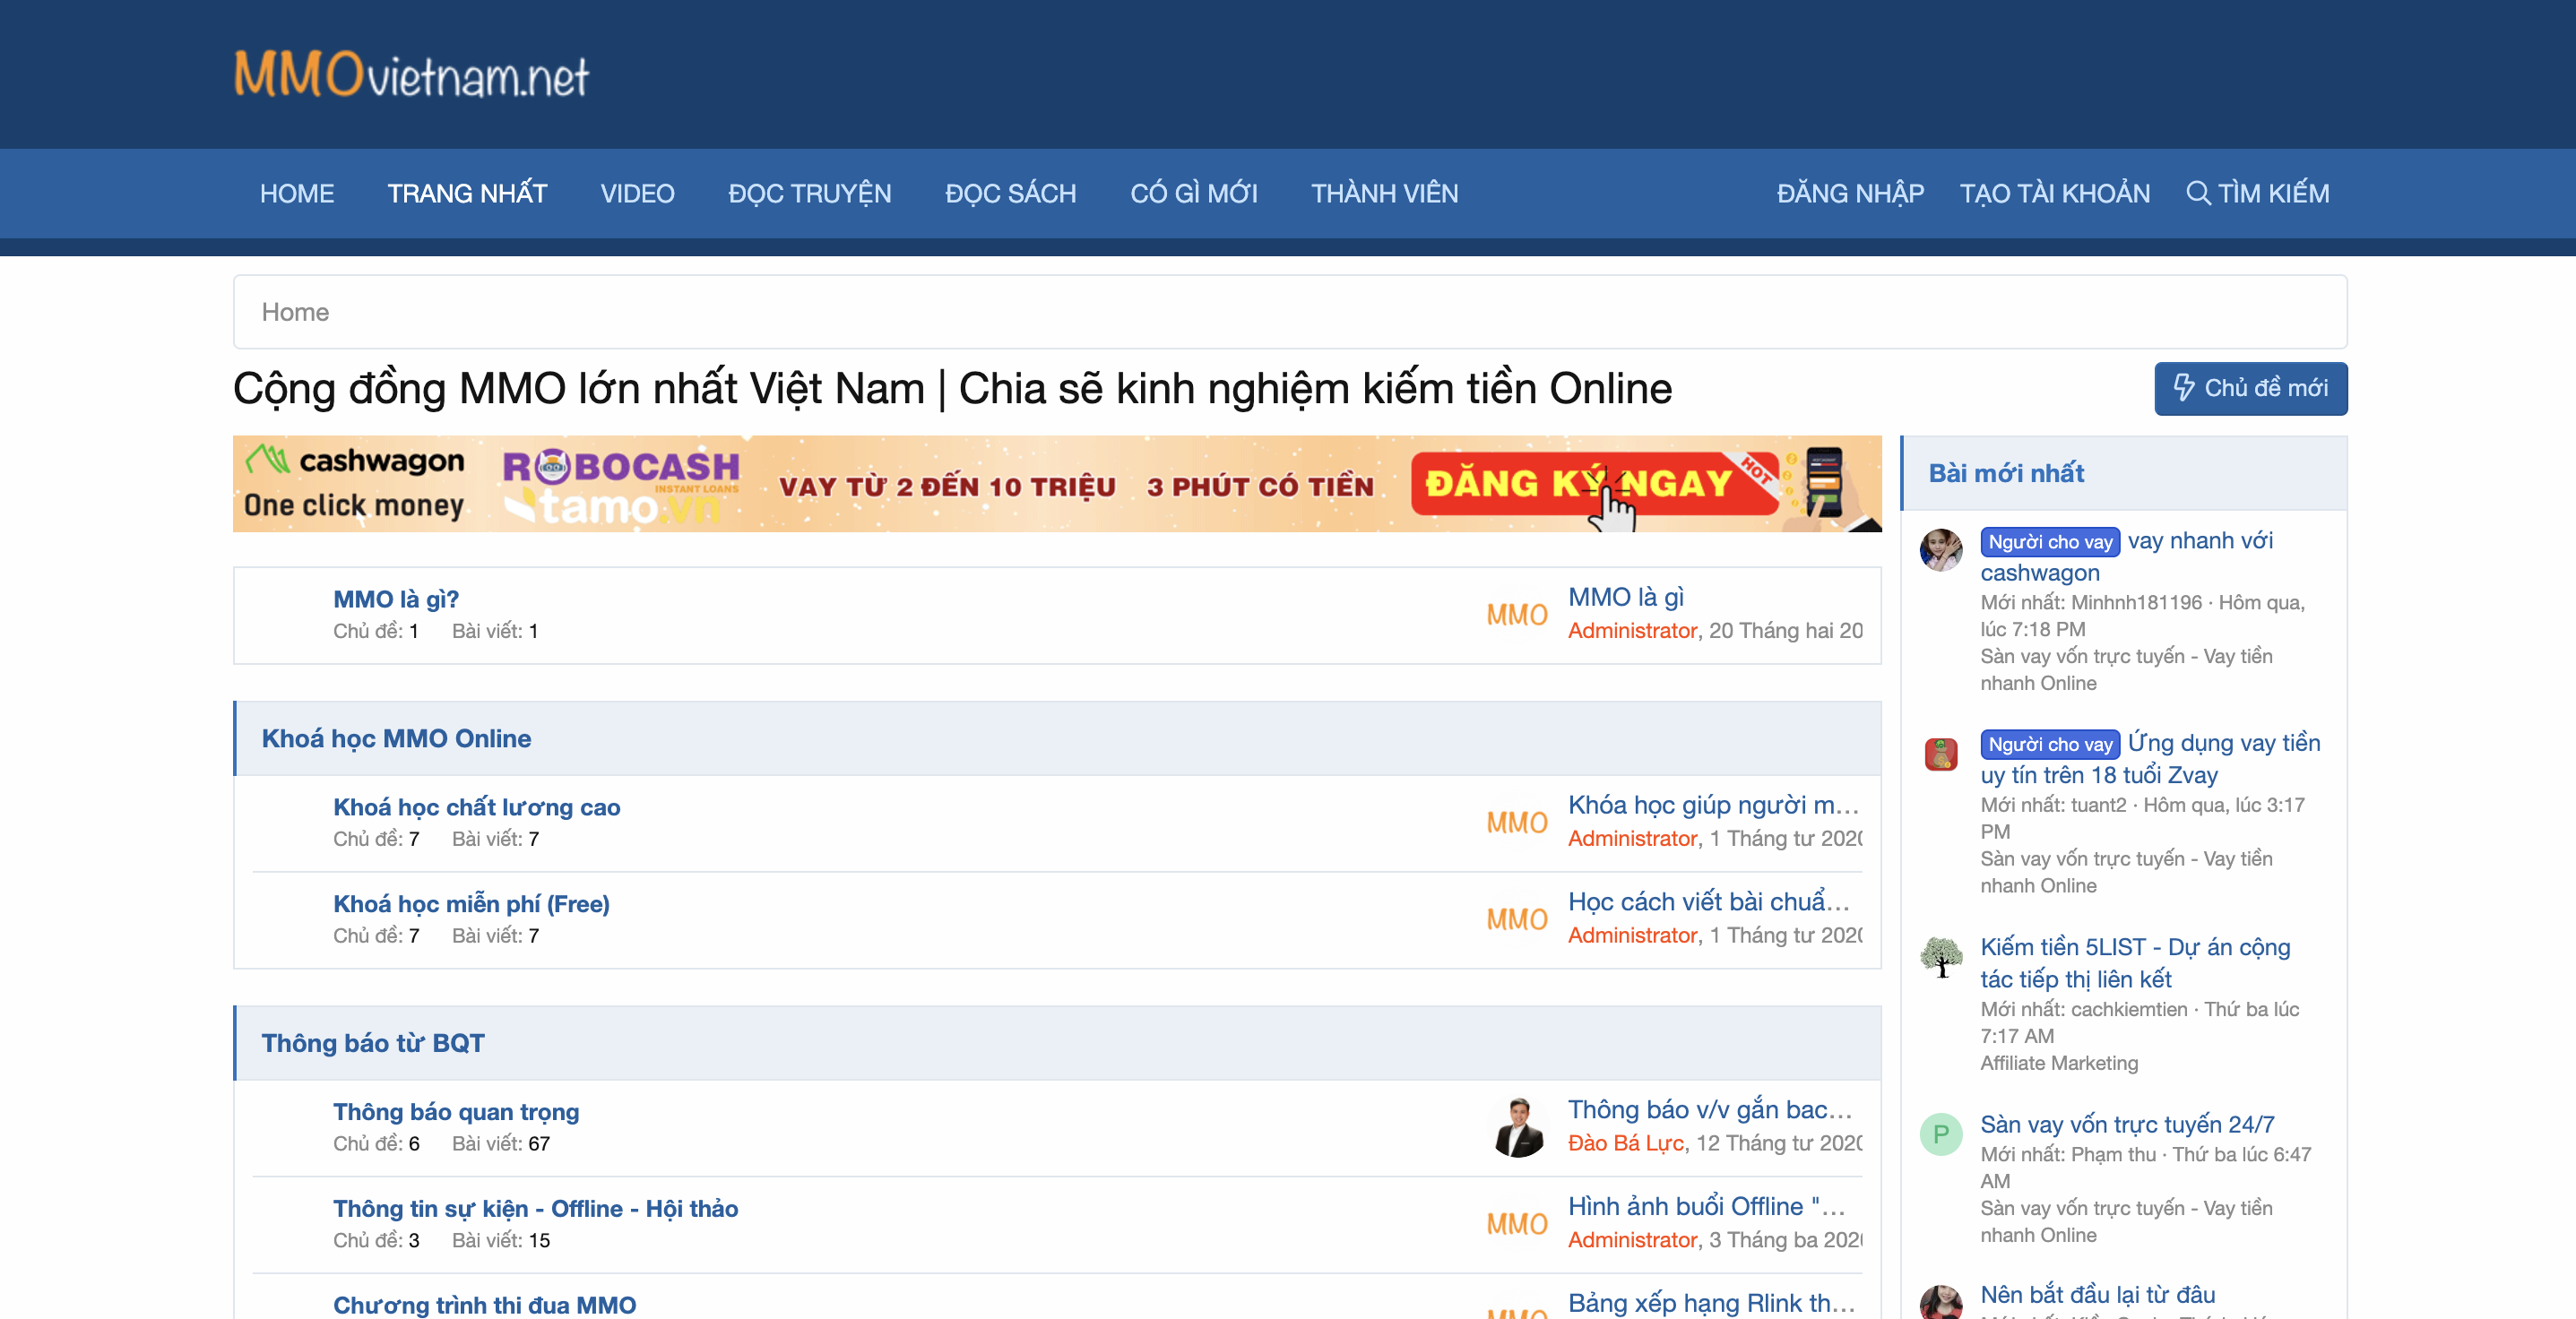 10+ Website cung cấp kiến thức về kiếm tiền Online (MMO) tốt nhất 2020 5